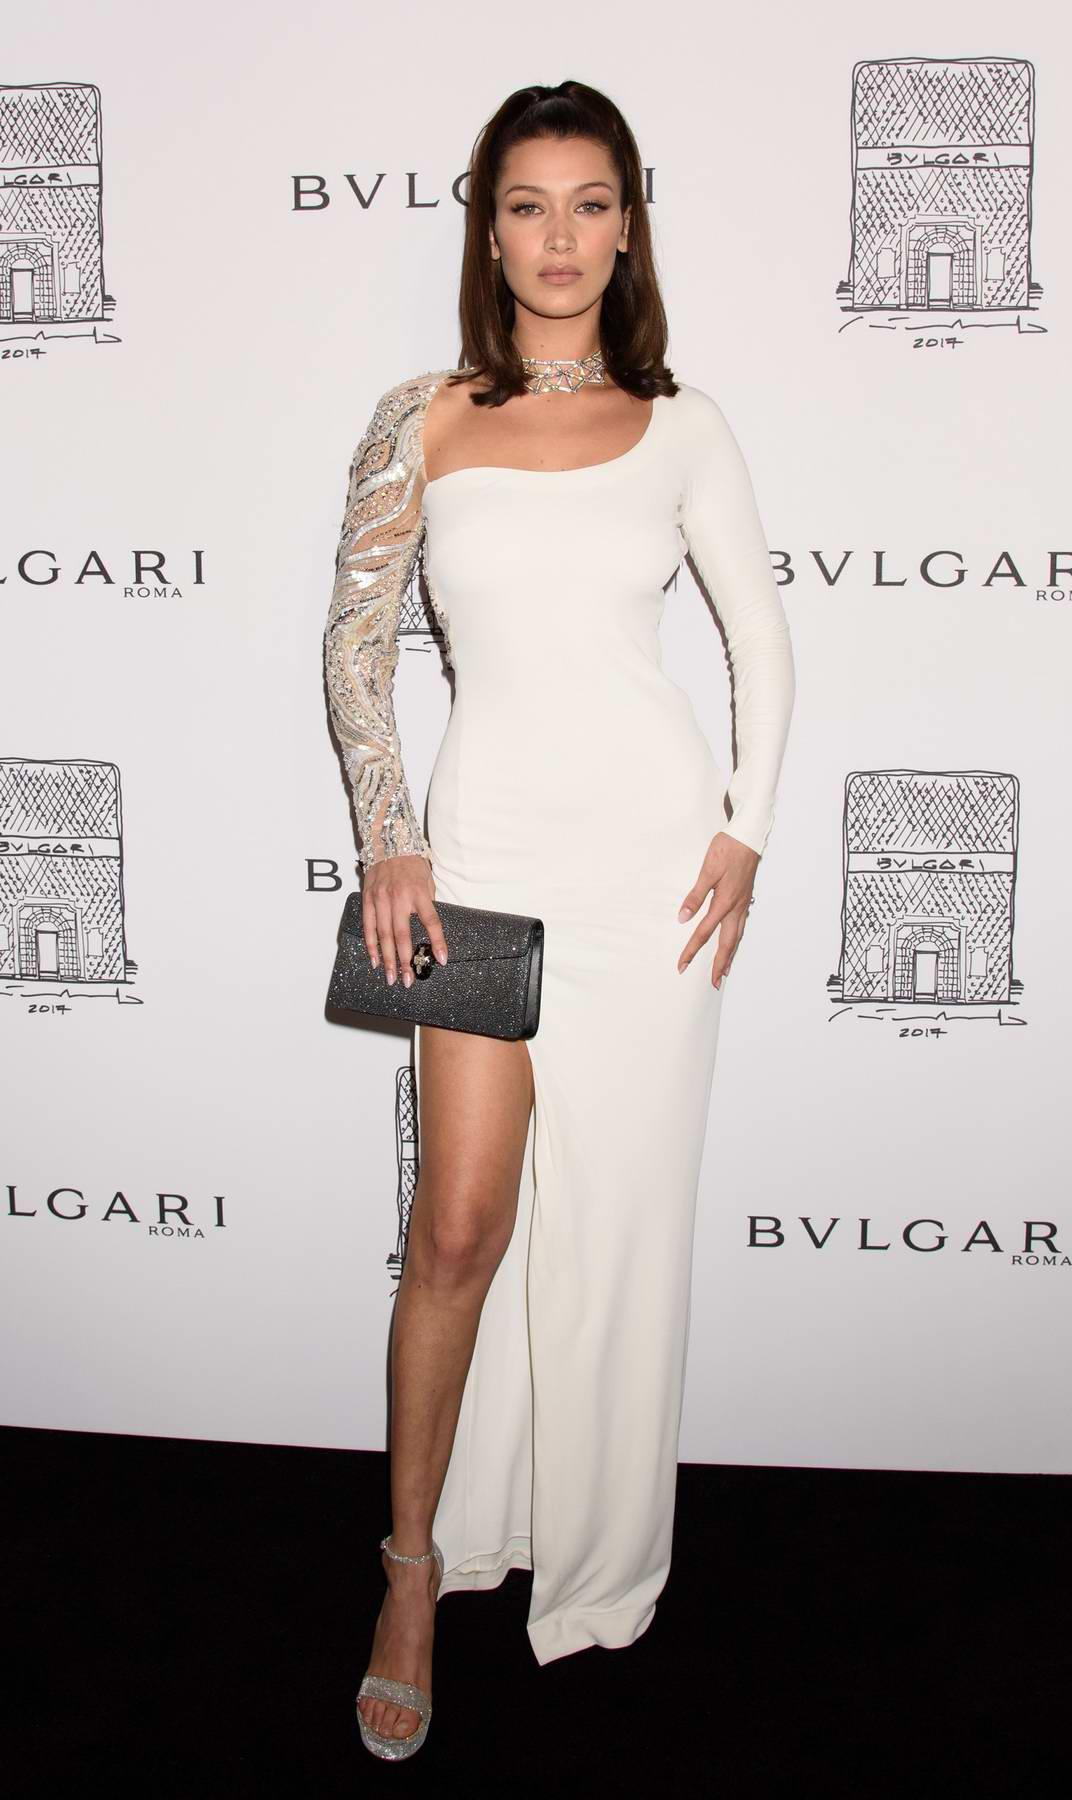 Bella Hadid at BVLGARI 5th avenue flagship store opening in New York